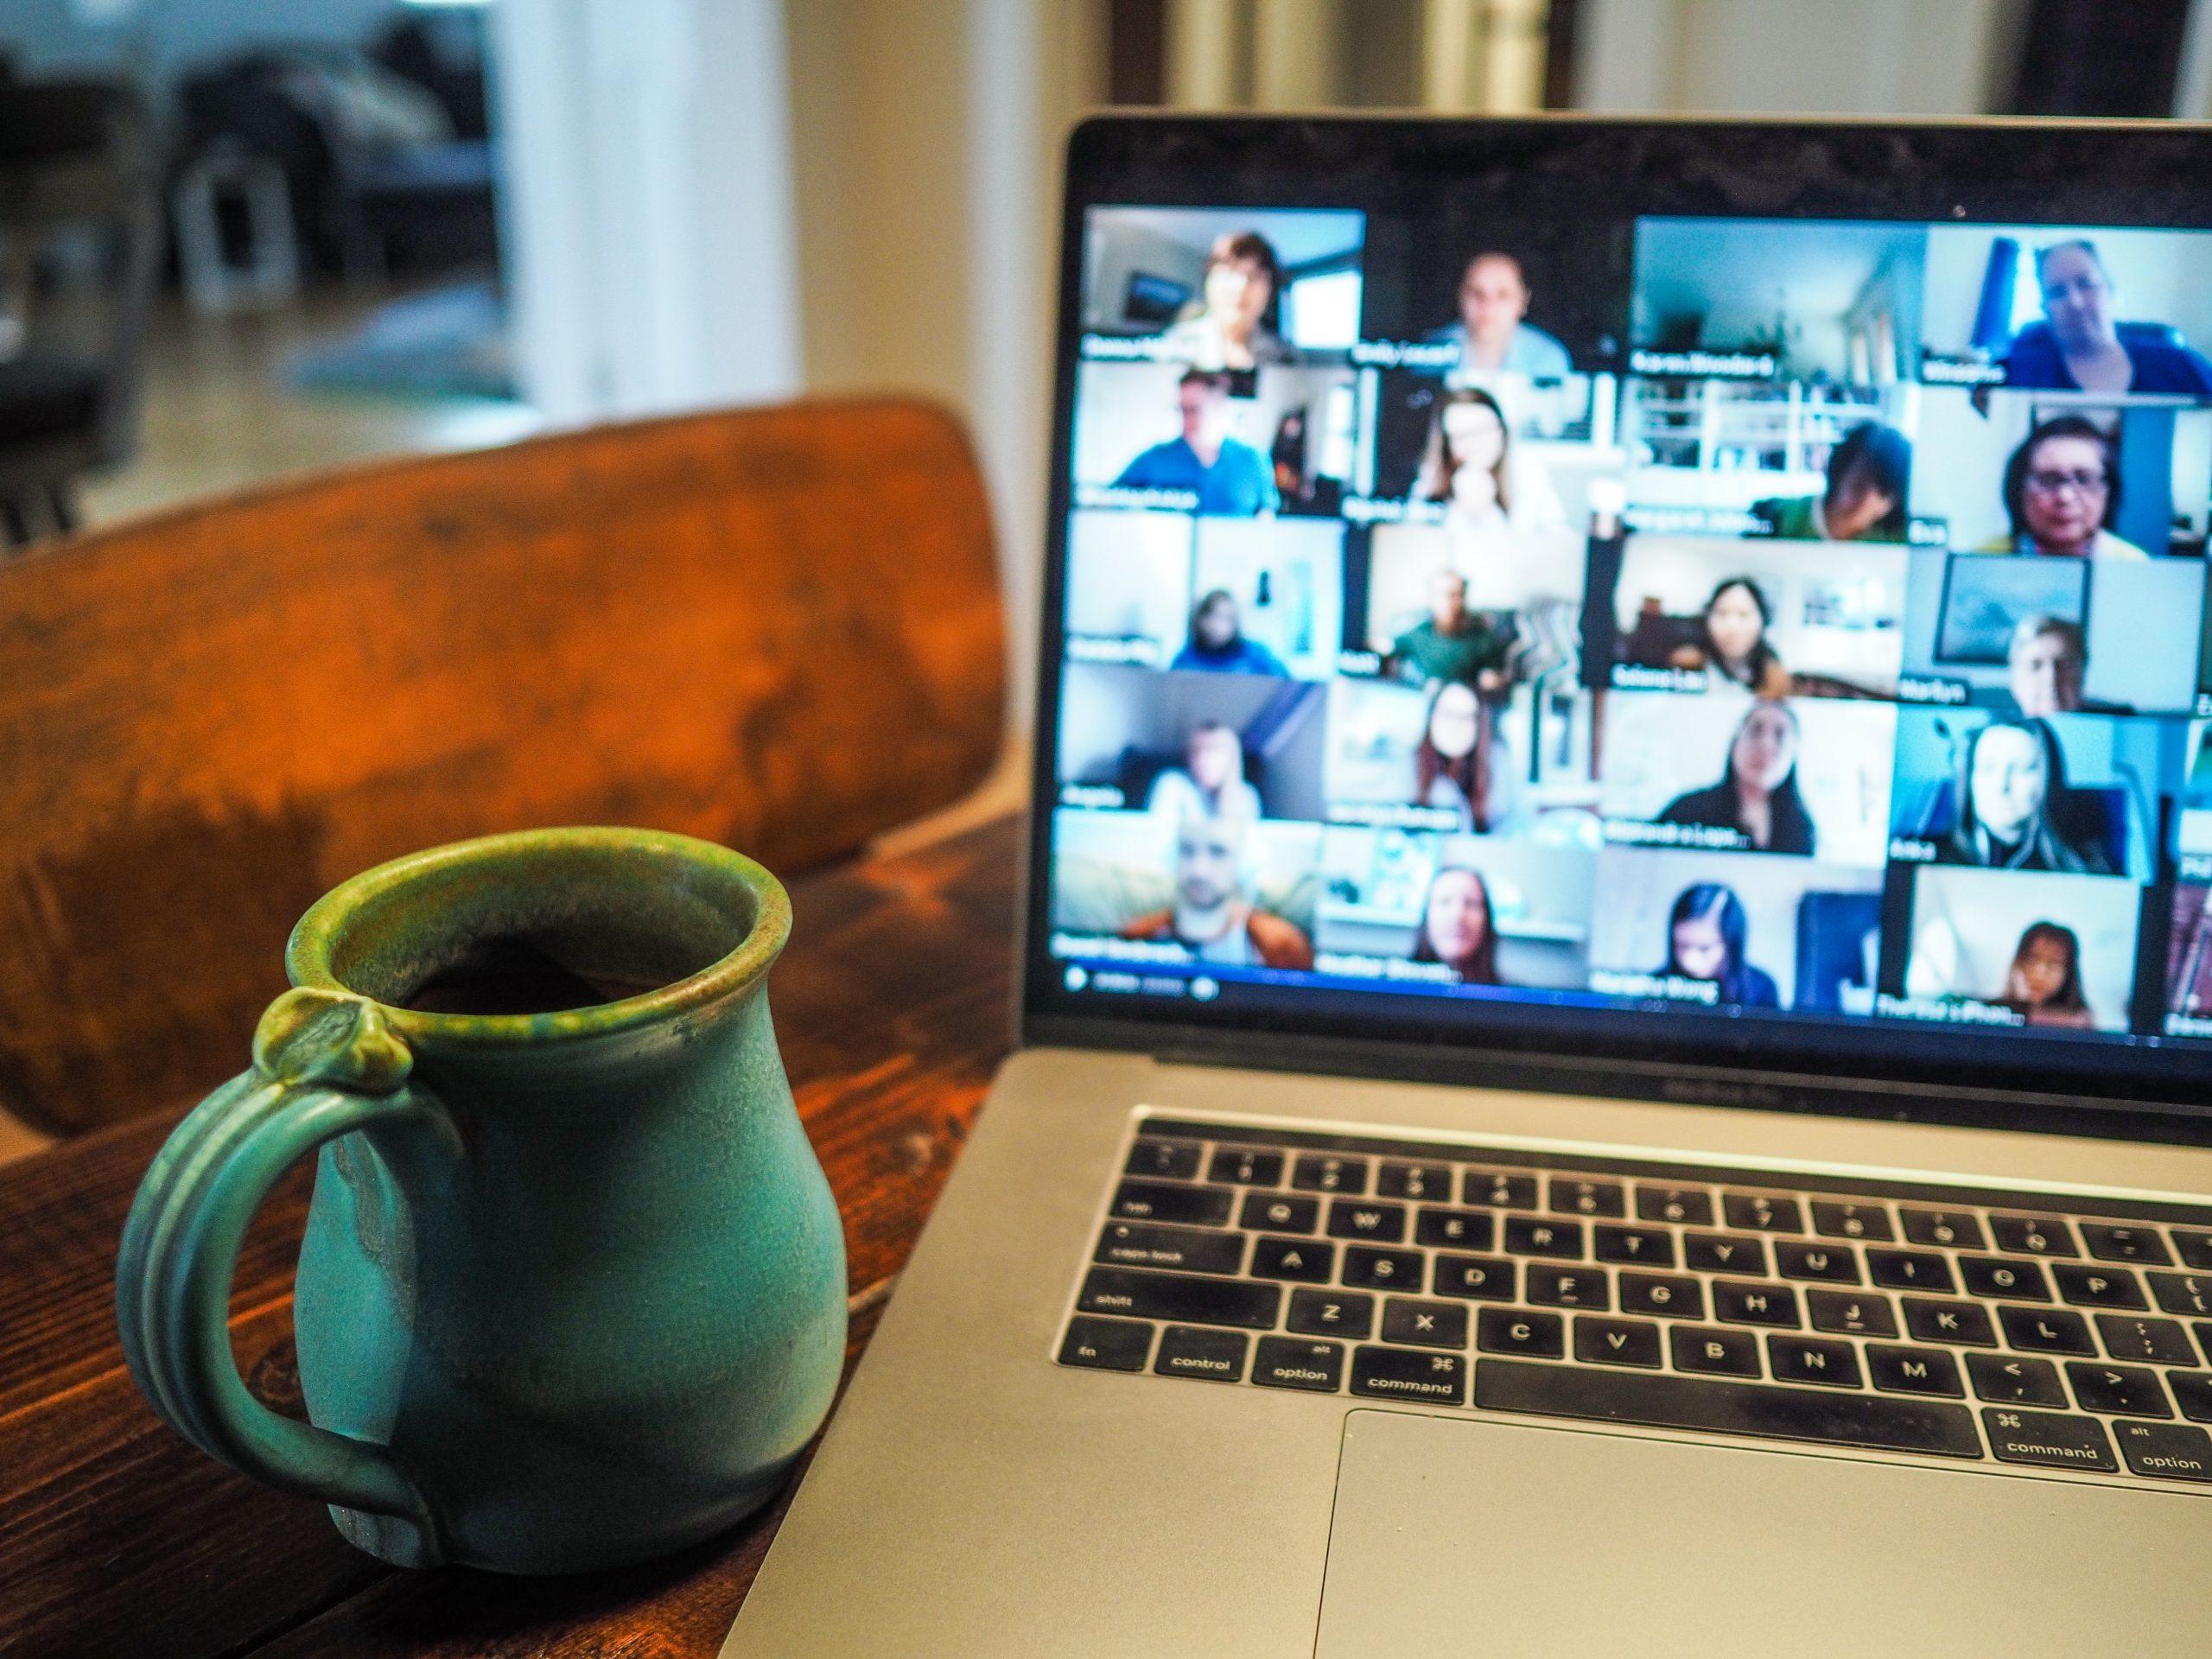 Laptop and mug